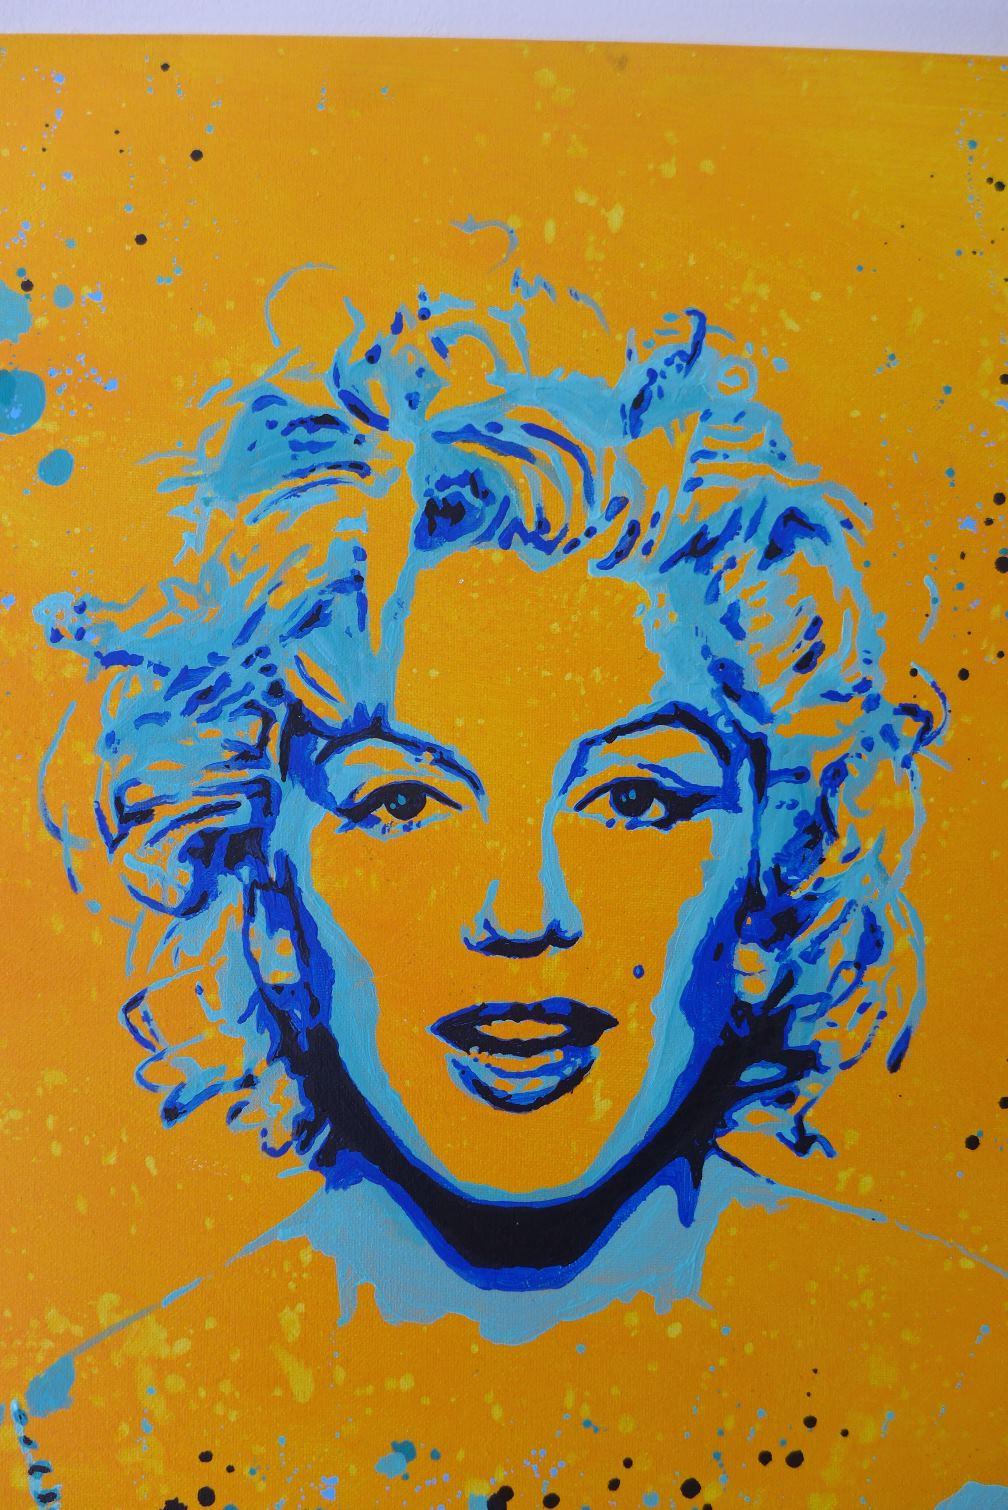 Tableau Street Art Marilyn Monroe splash detail- Slave 2.0